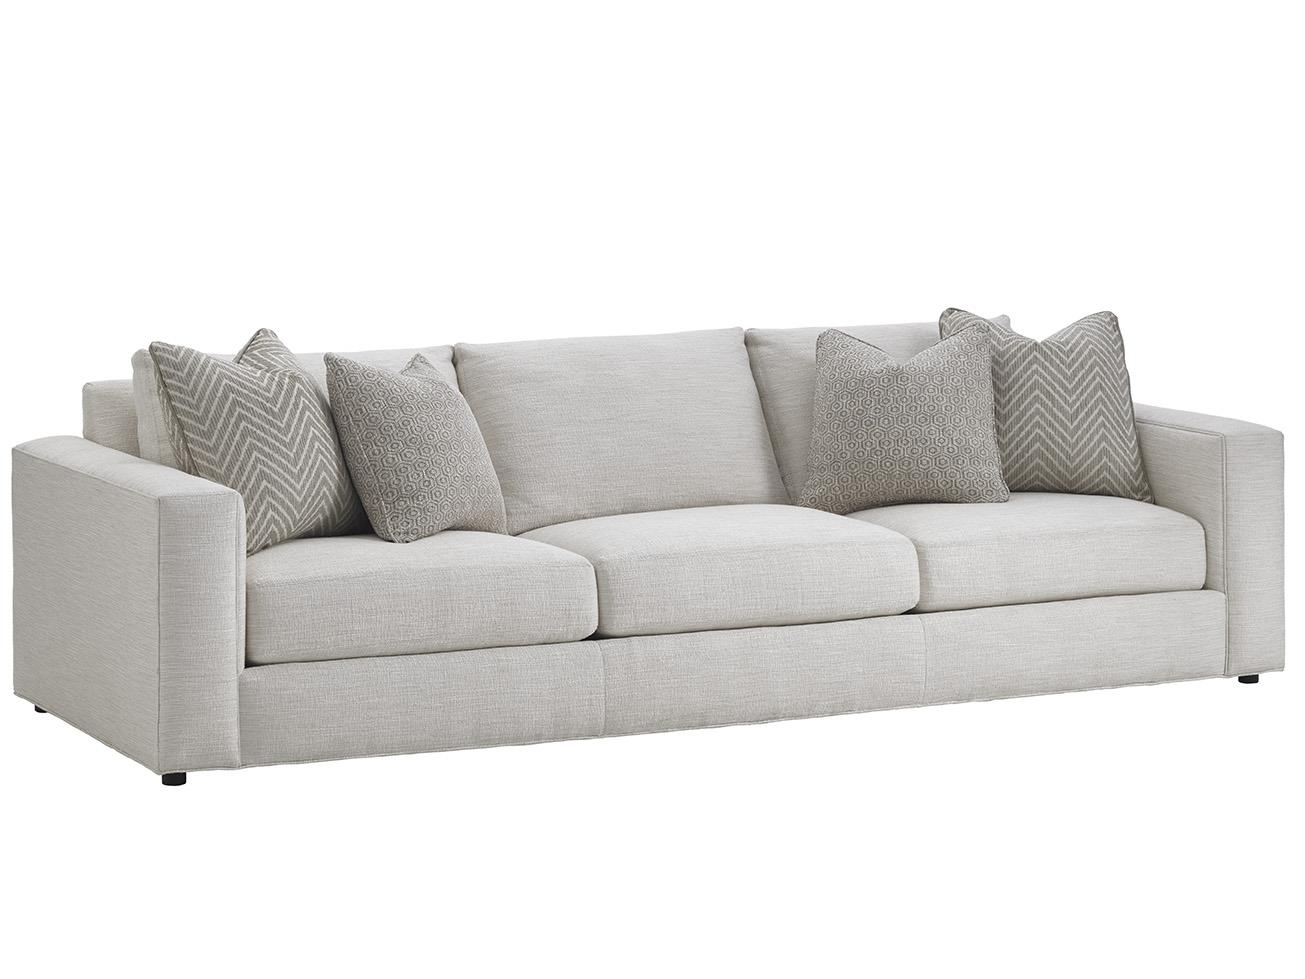 LAUREL CANYON Bellevue Sofa by Lexington at Johnny Janosik